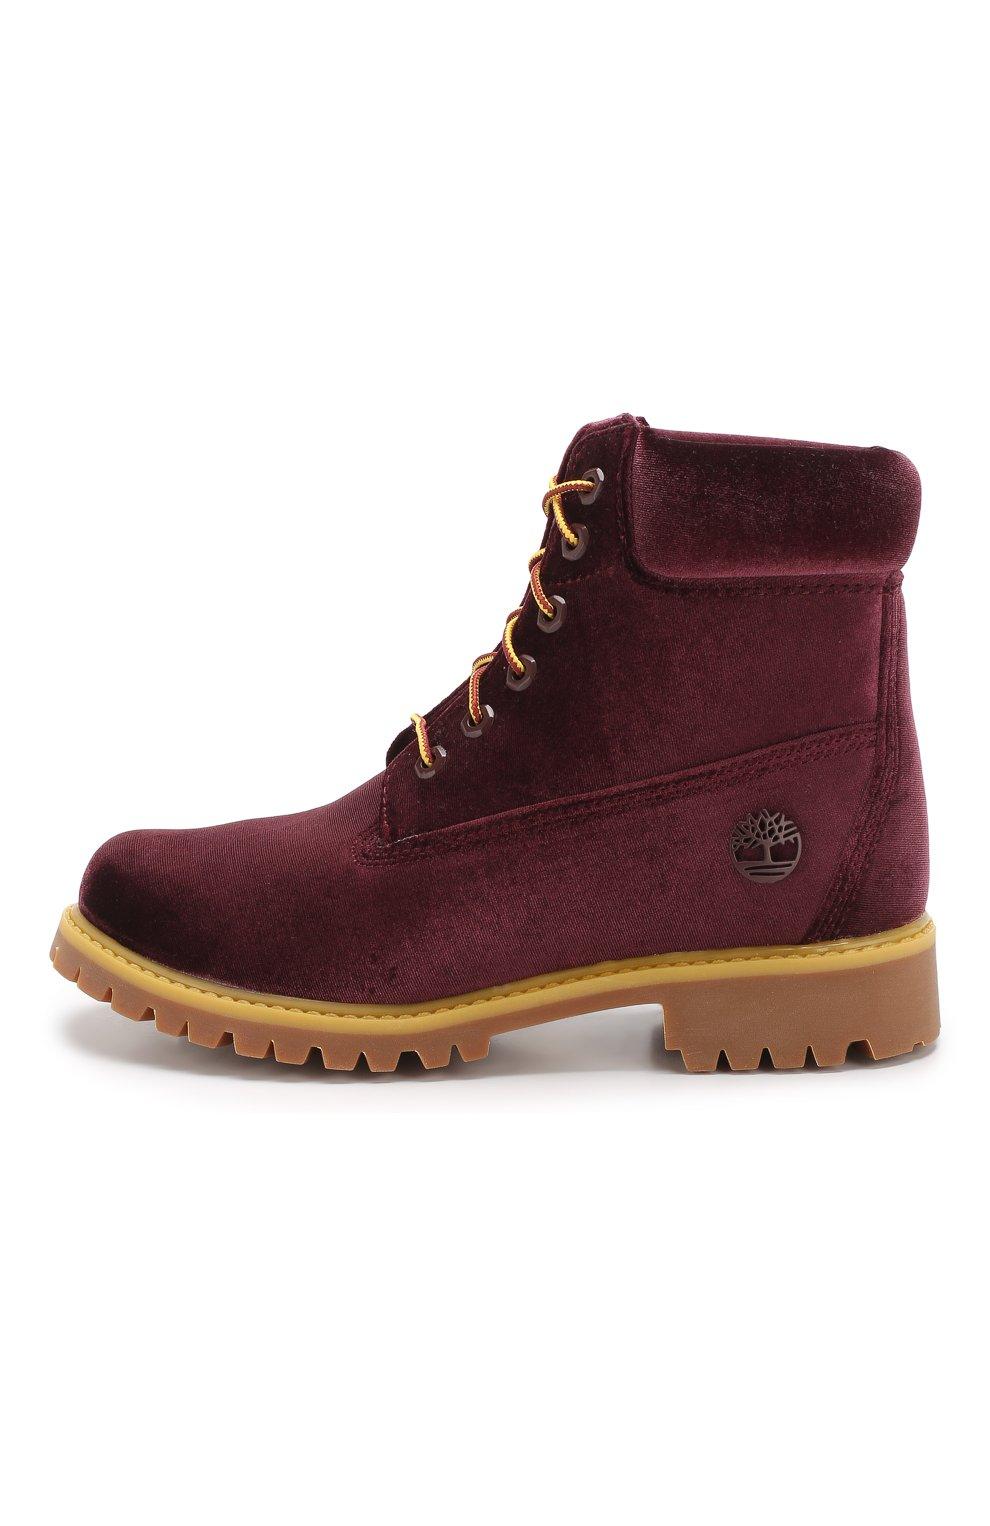 6e1835b4aace Текстильные ботинки Off-White x Timberland